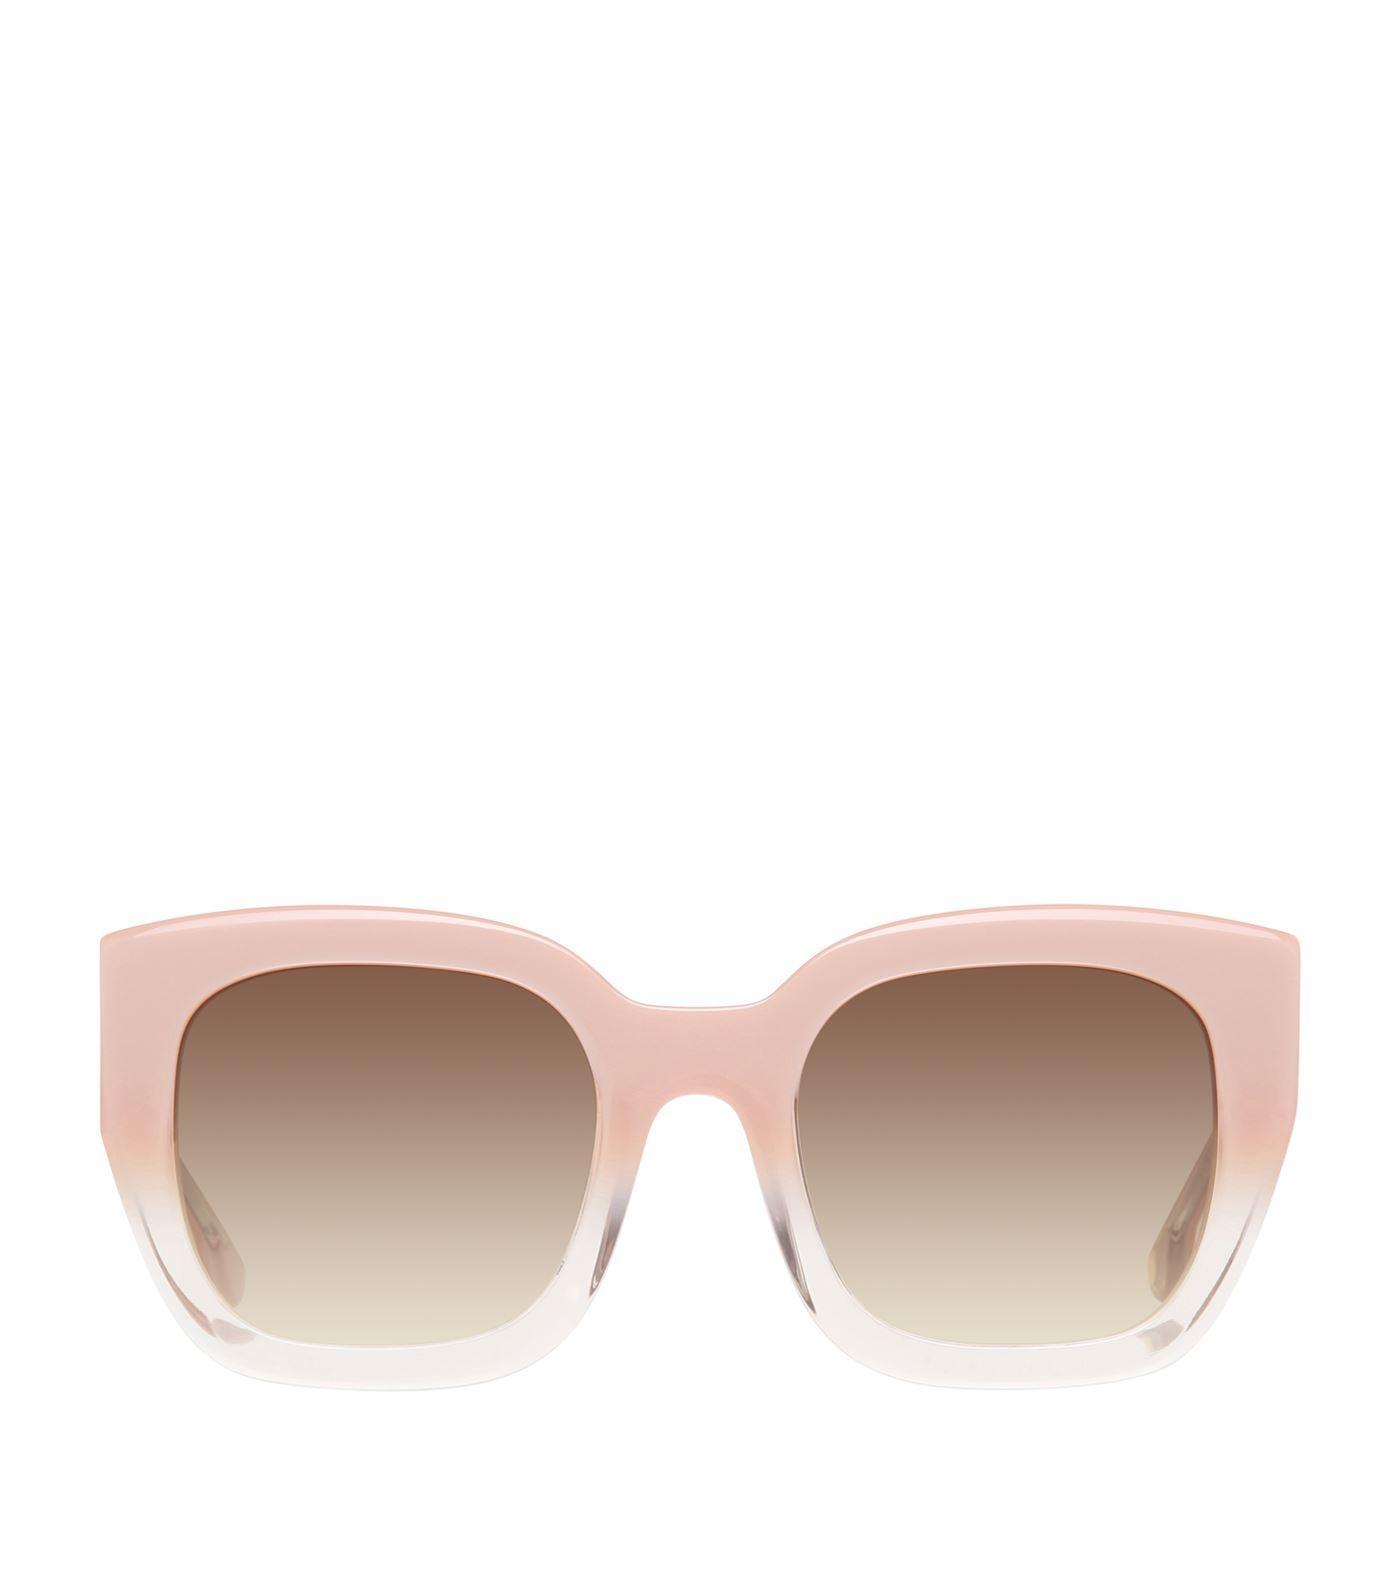 1c24379bc4 Alice And Olivia Aberdeen Square Sunglasses In Harrods